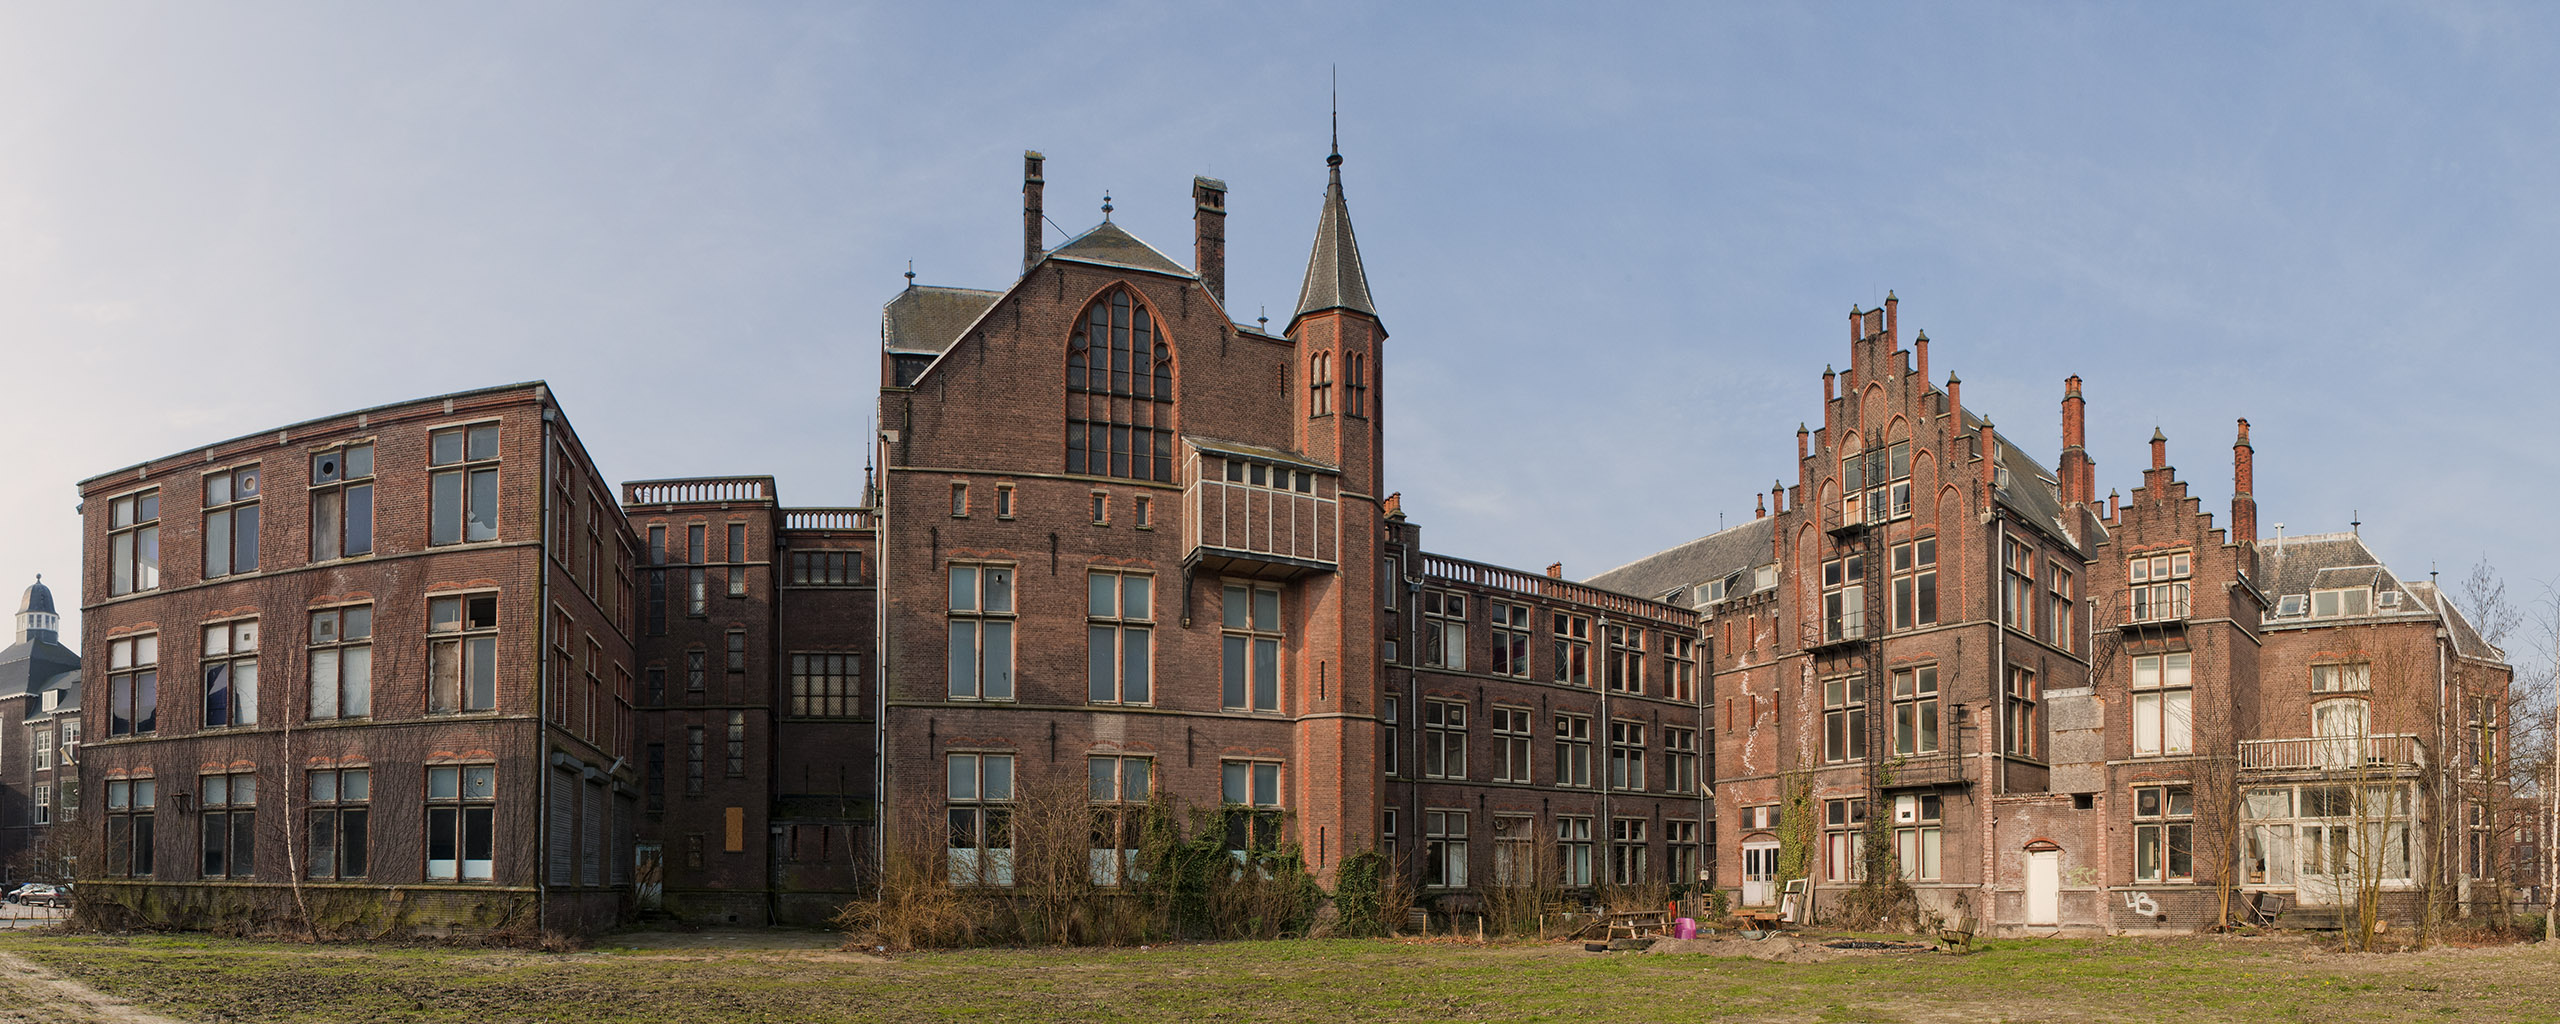 Delft 1-panorama